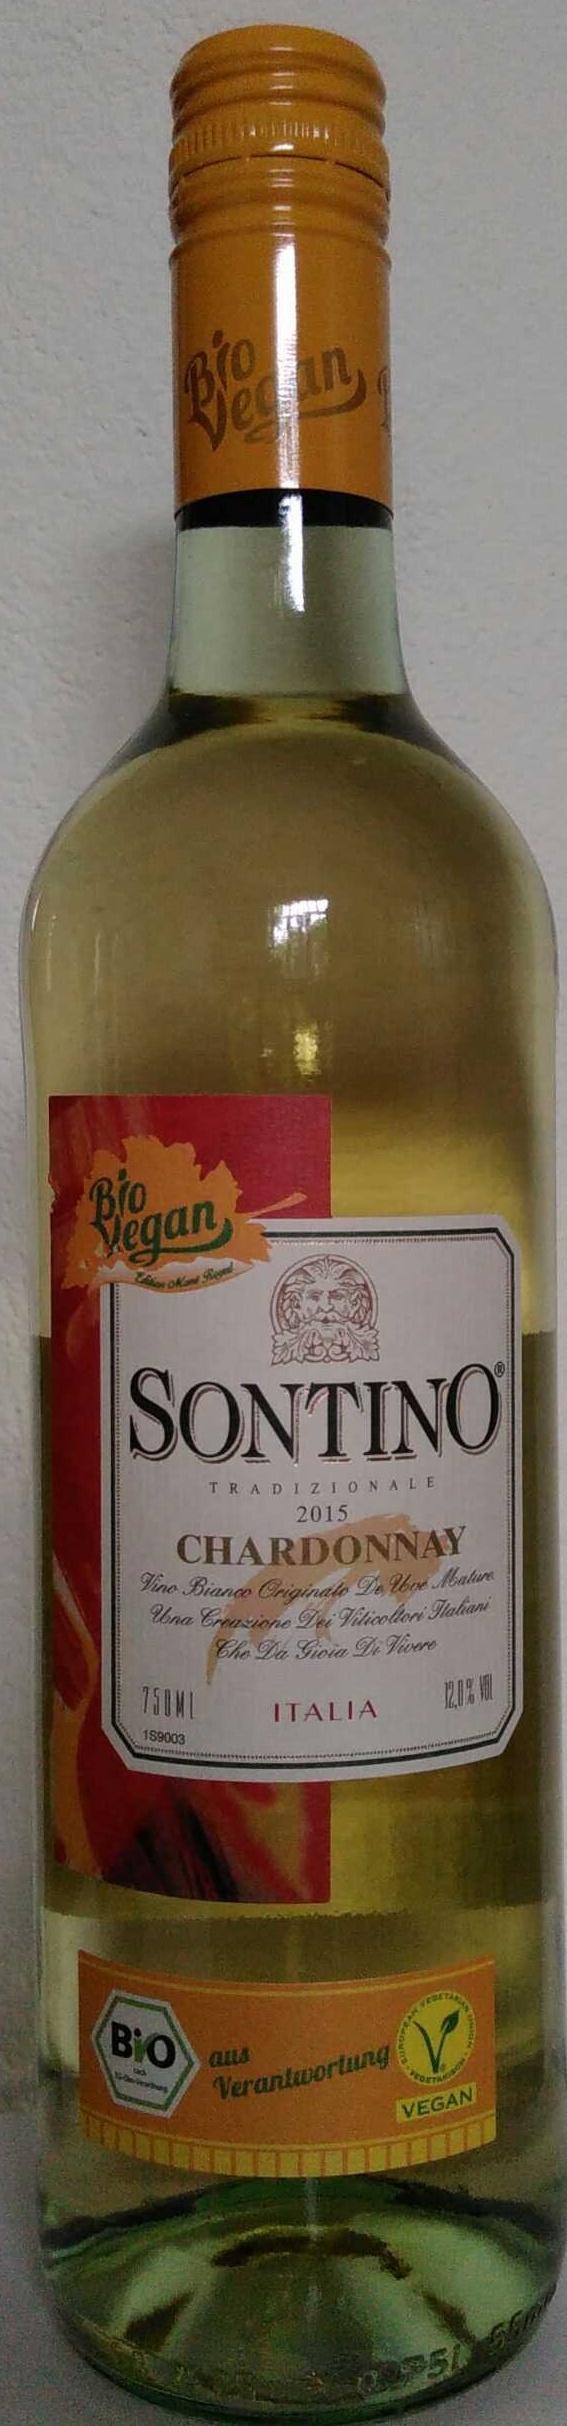 Chardonnay 2015 - Product - de